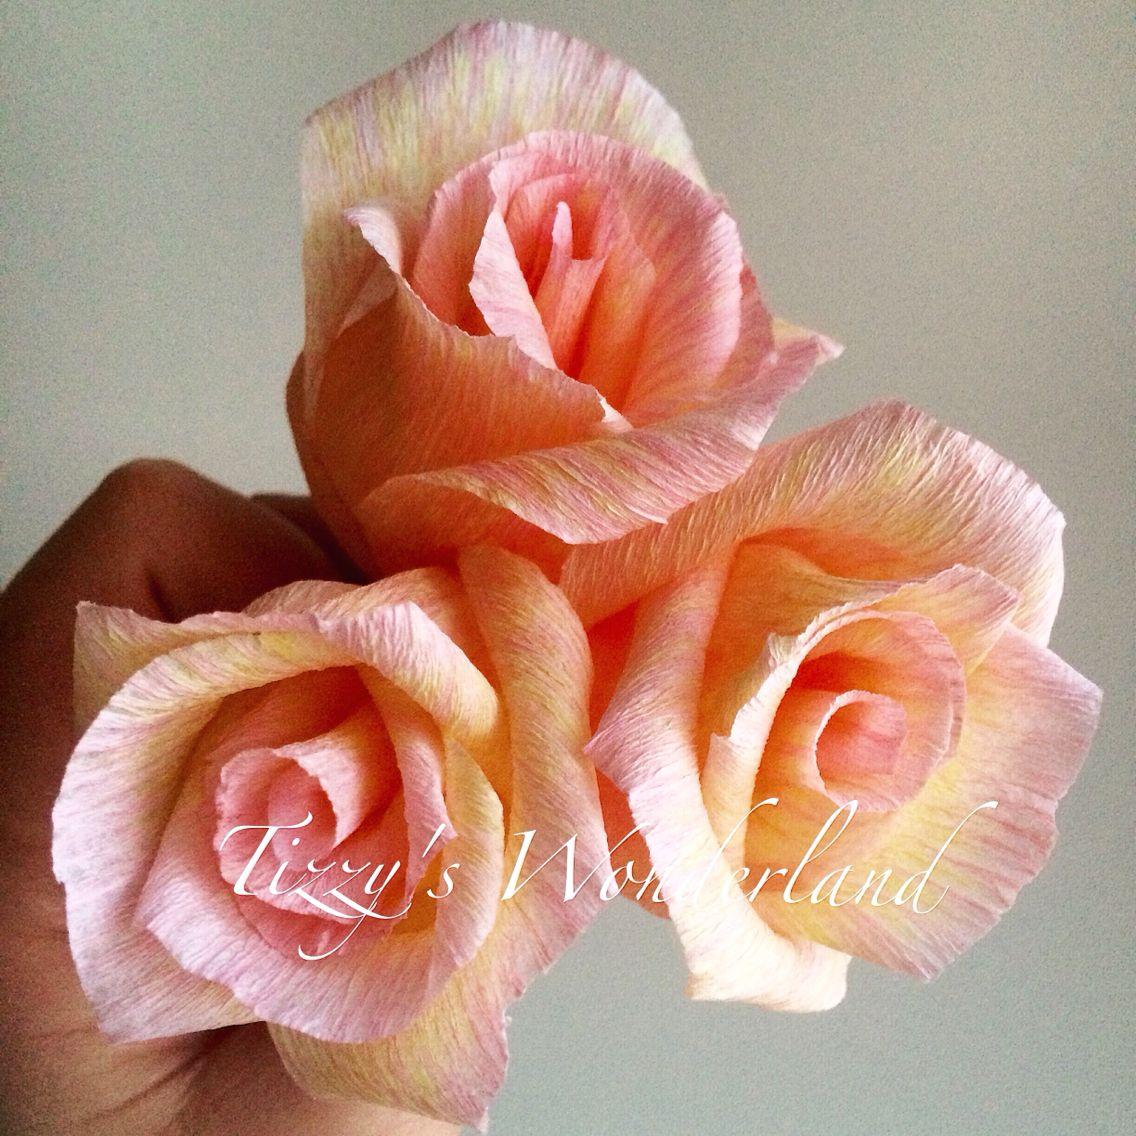 Papaveri Di Carta Crespa crepe paper roses! rose di carta crespa! | flowers | fiori